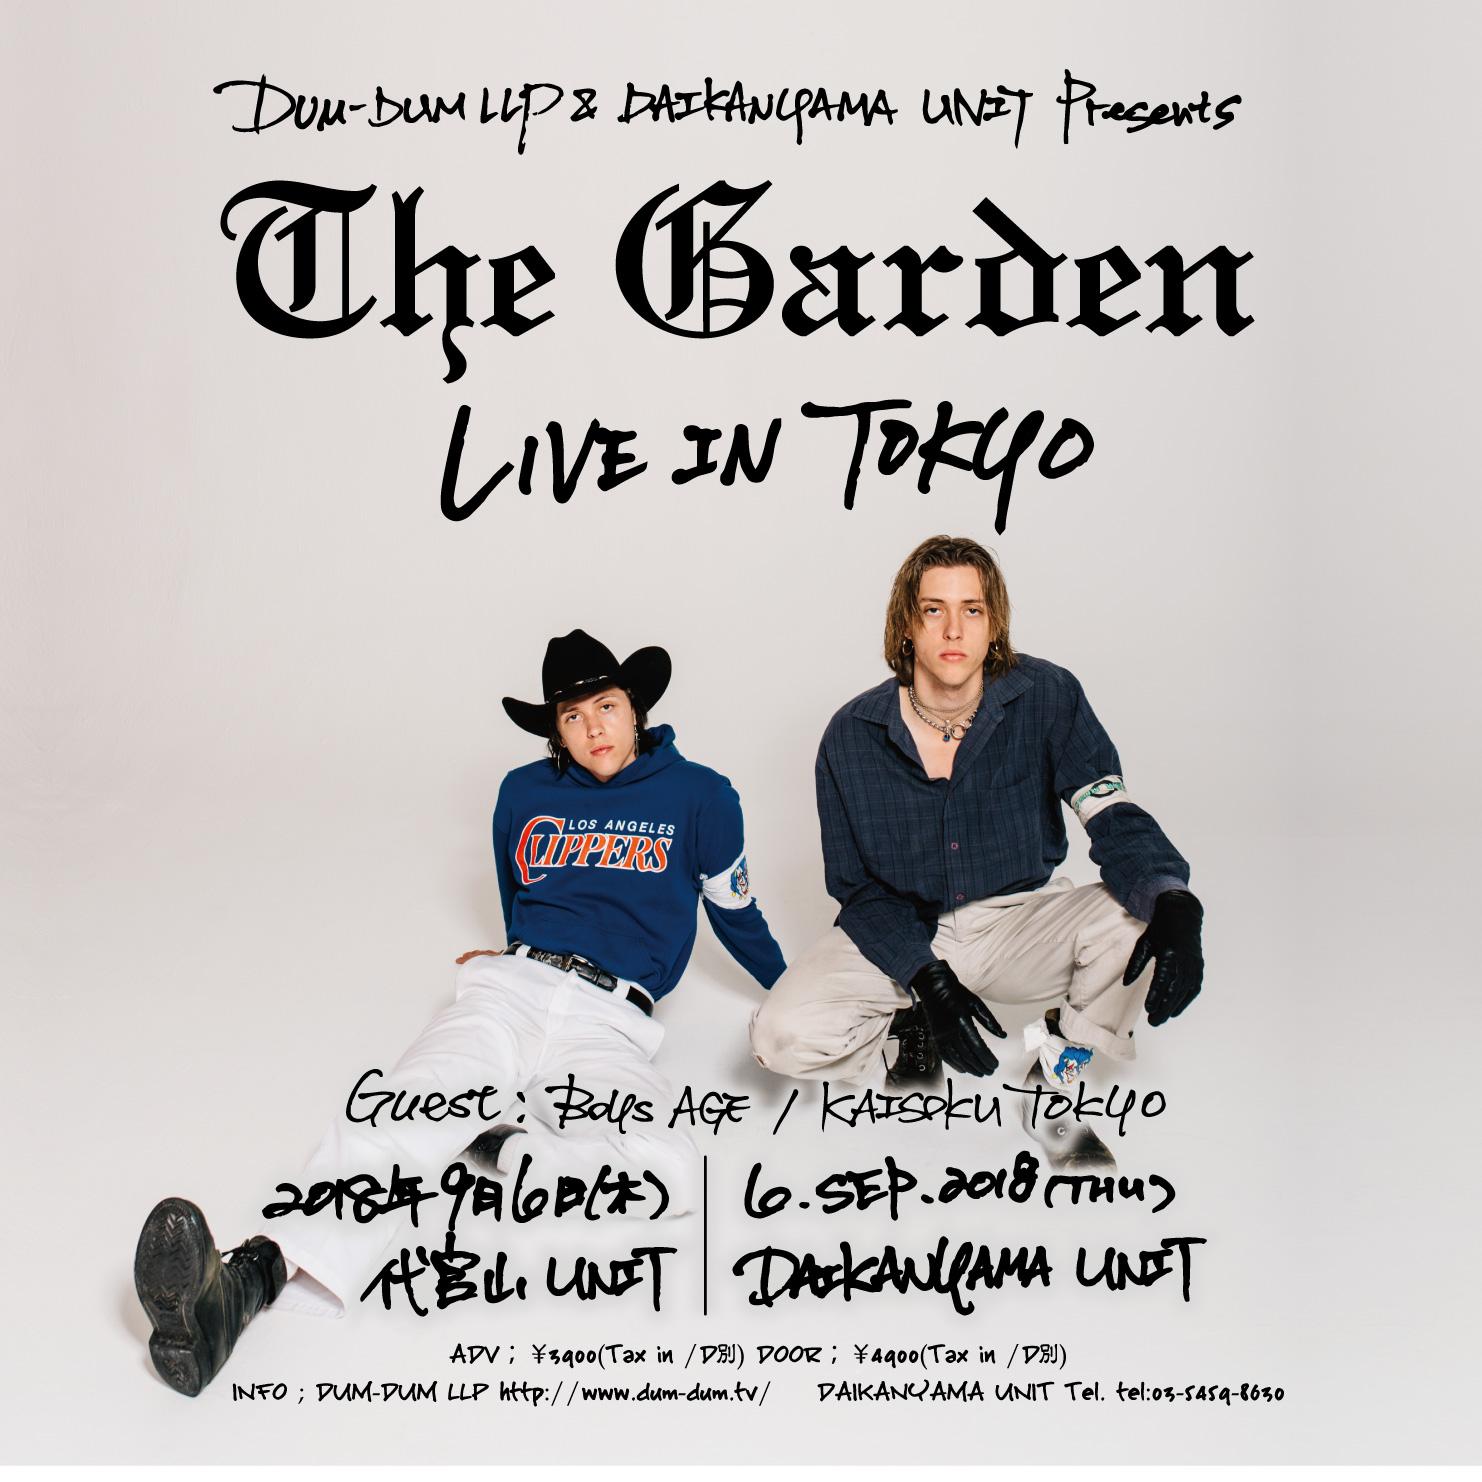 thegarden-flyer-1